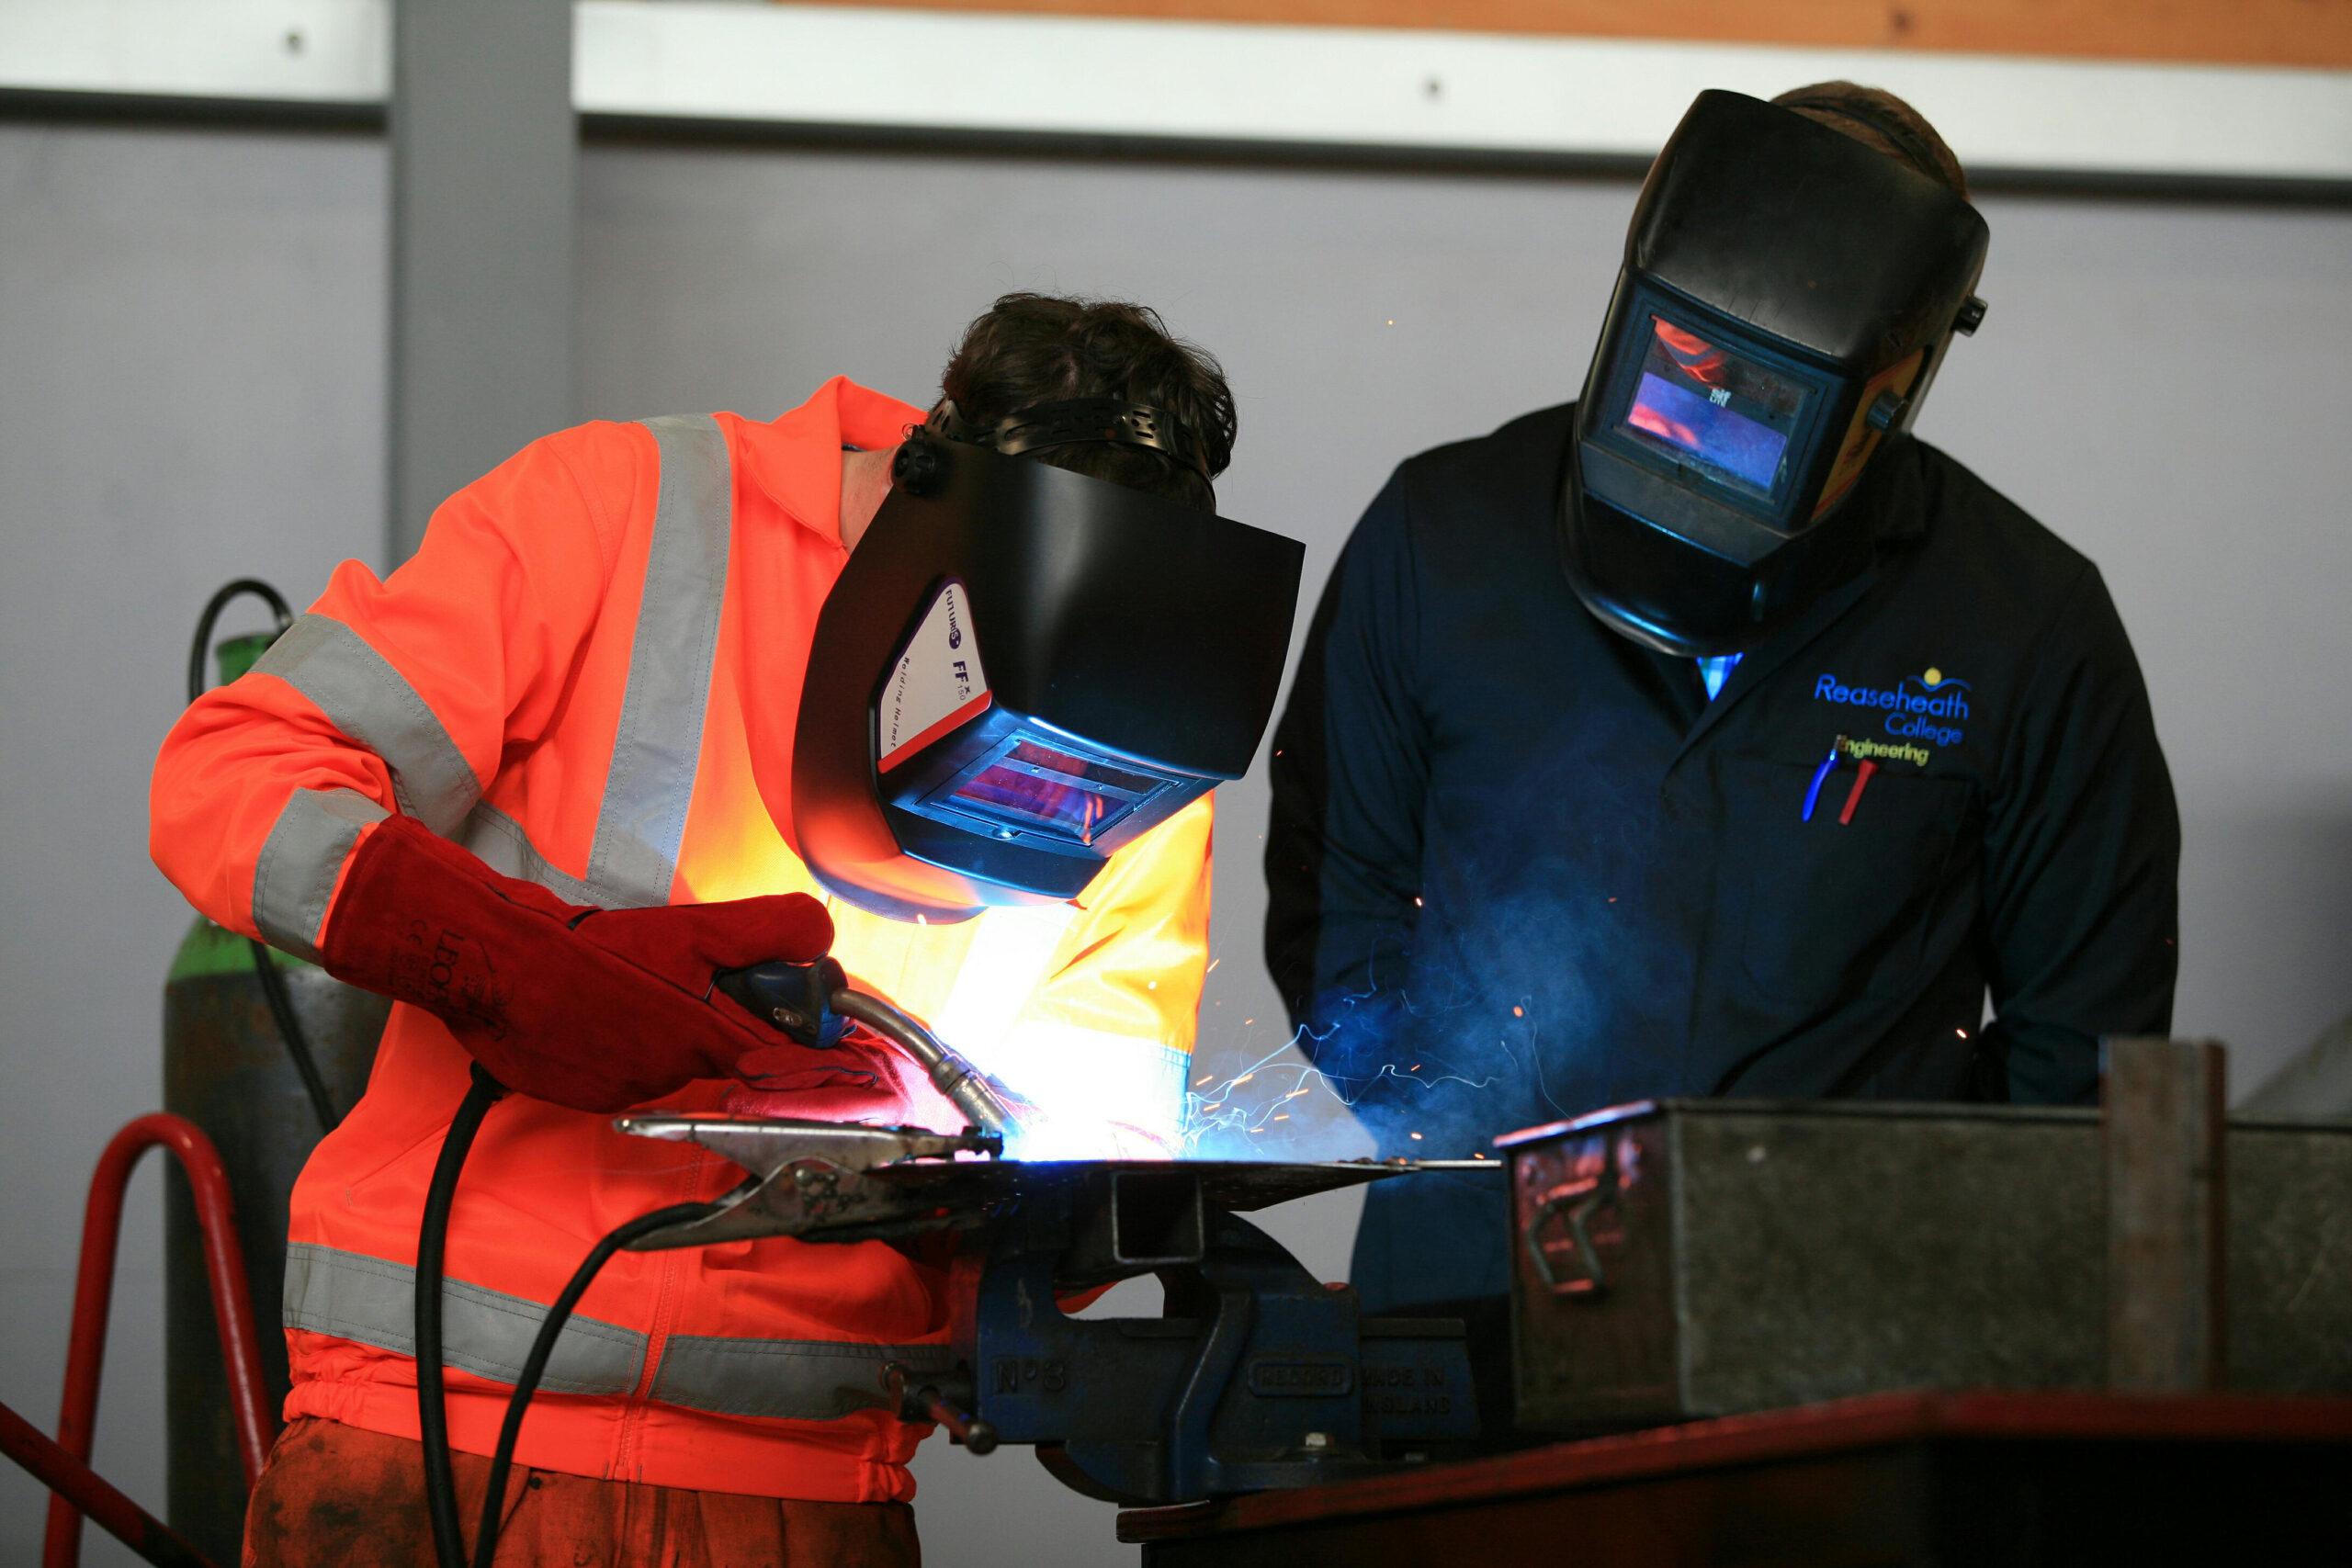 Cash bonus scheme for hiring apprentices is set to double to £3,000